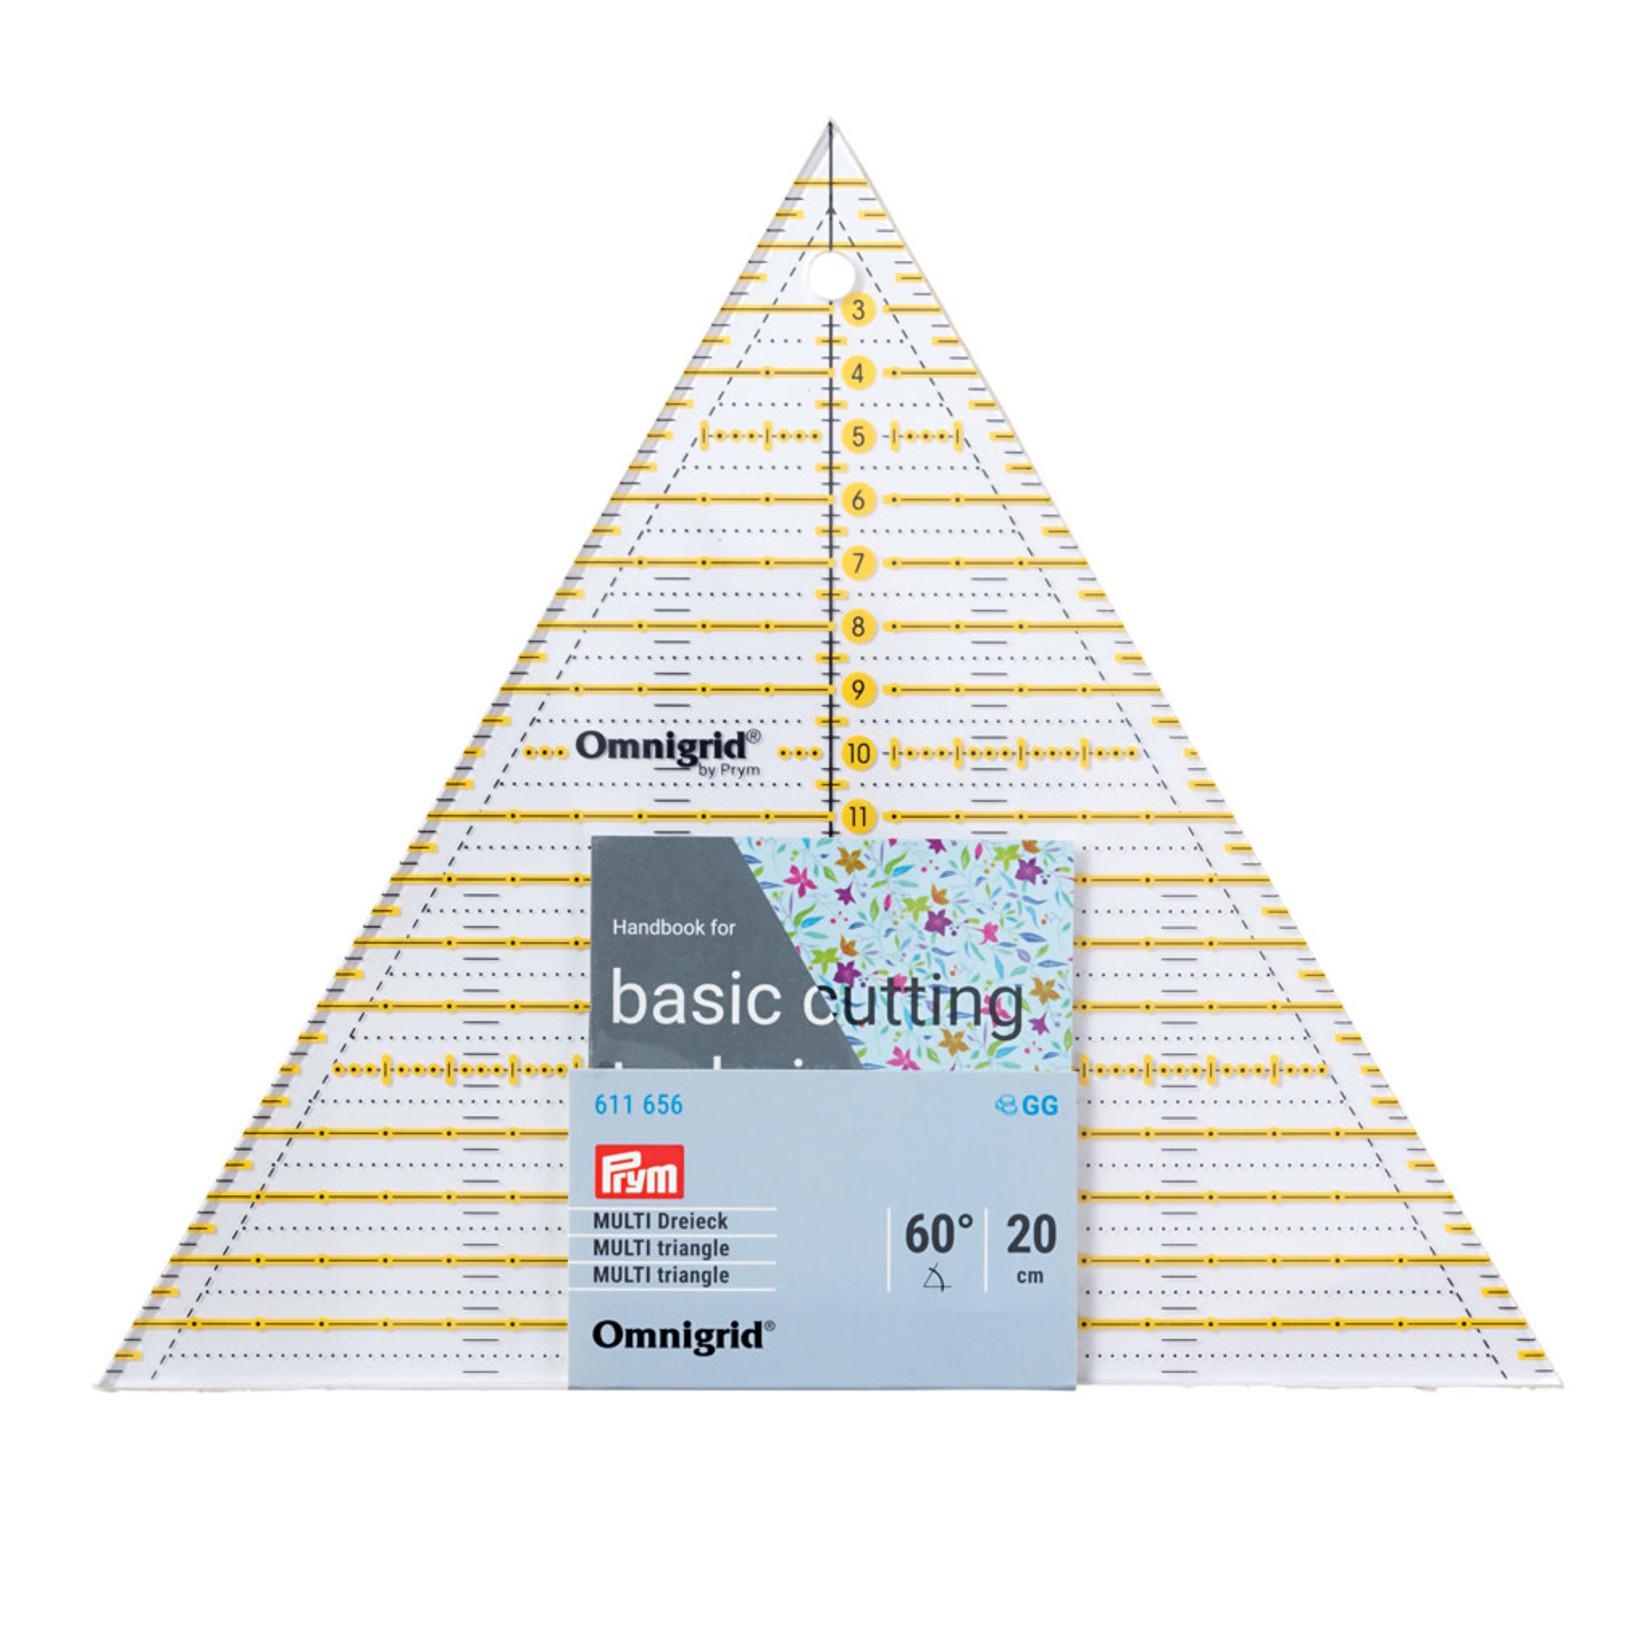 Omnigrid Liniaal - Prym - 20 cm - 60° Driehoek